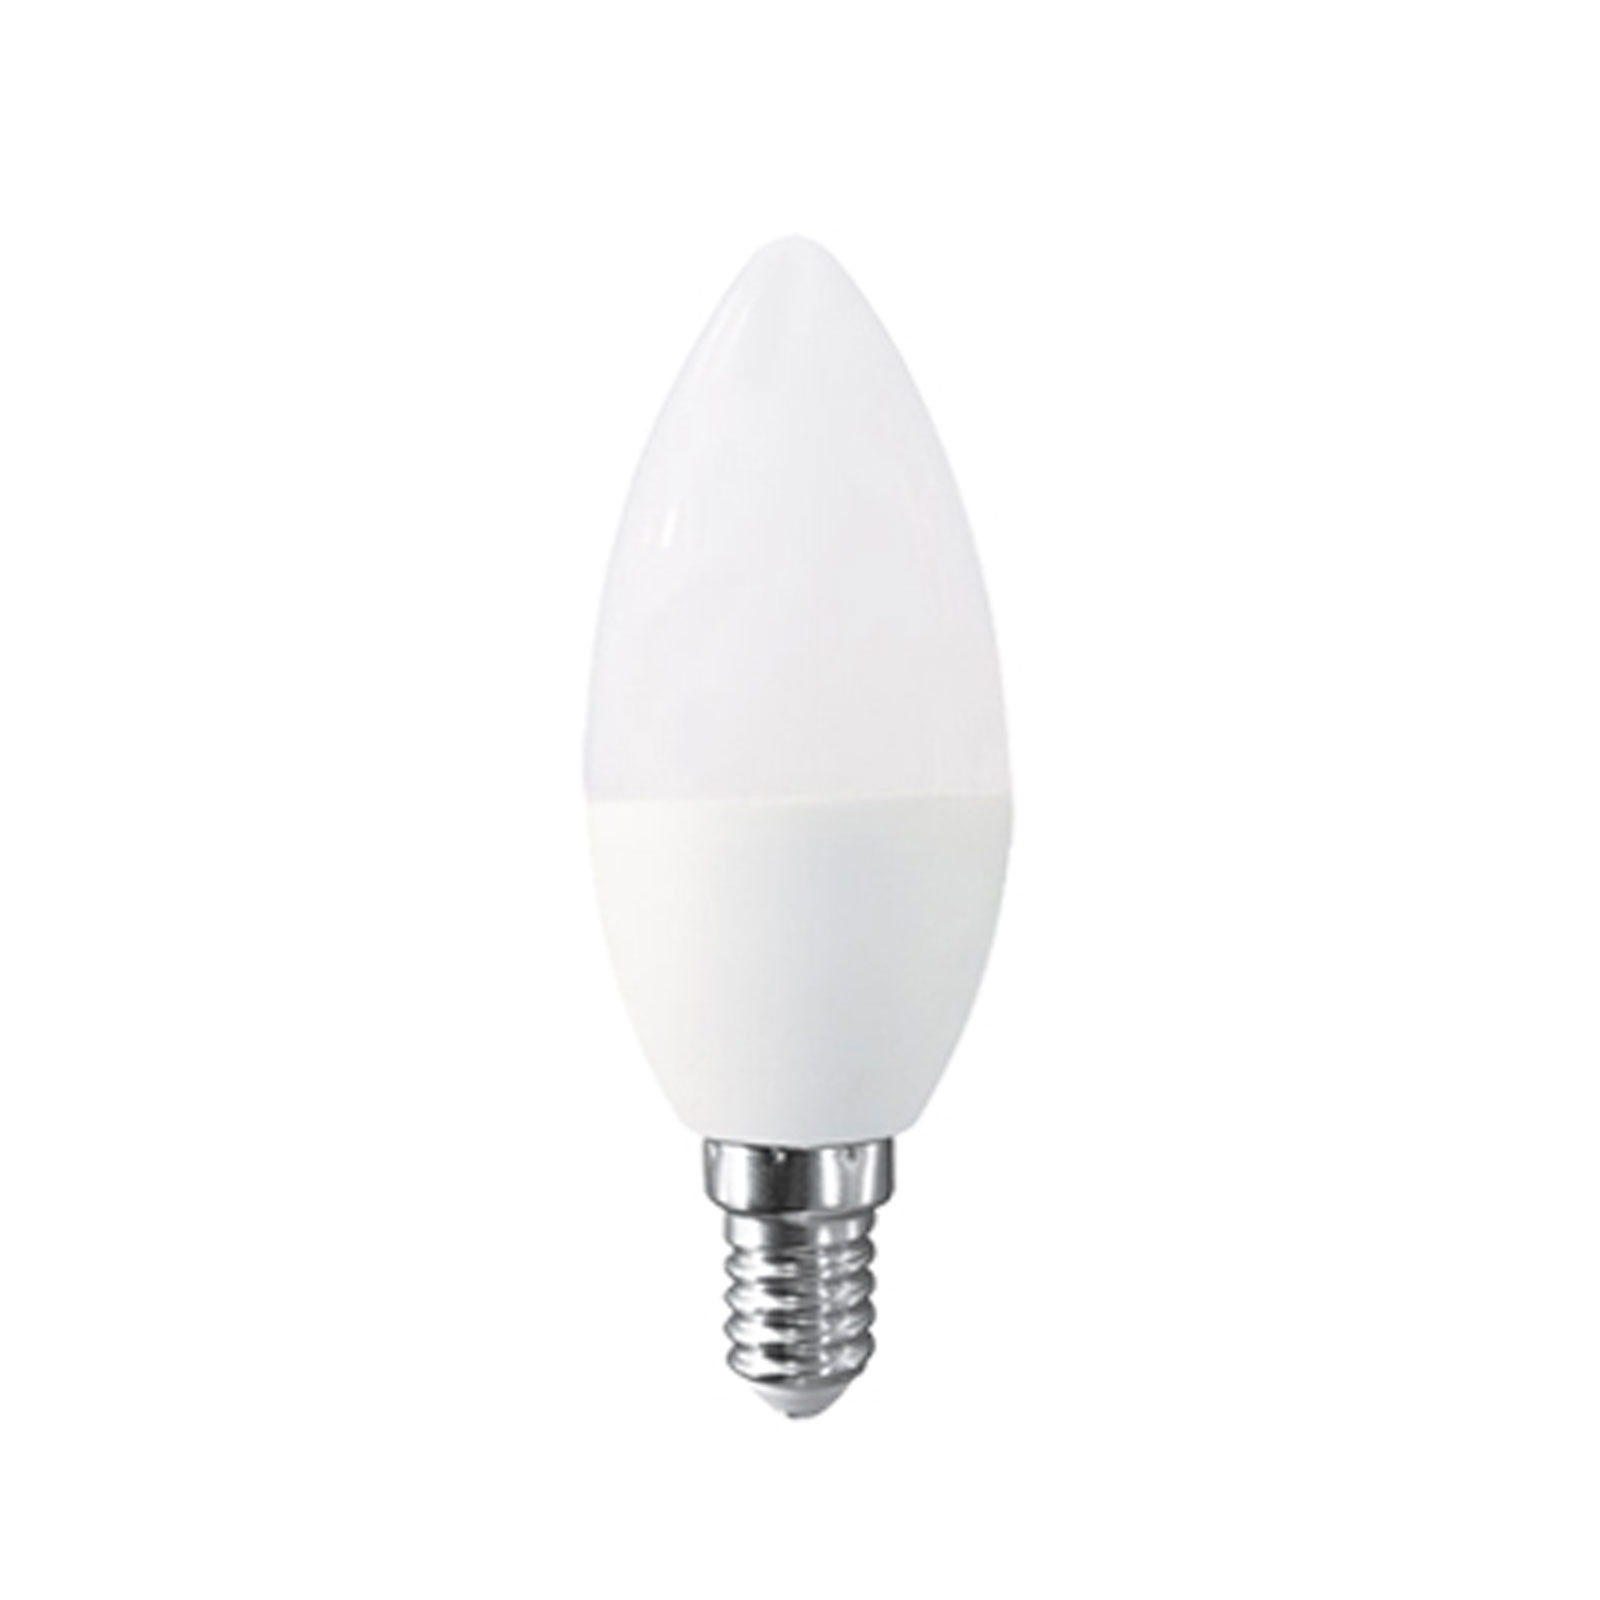 لامپ شمعی کندل 3 وات مات تکنوتل